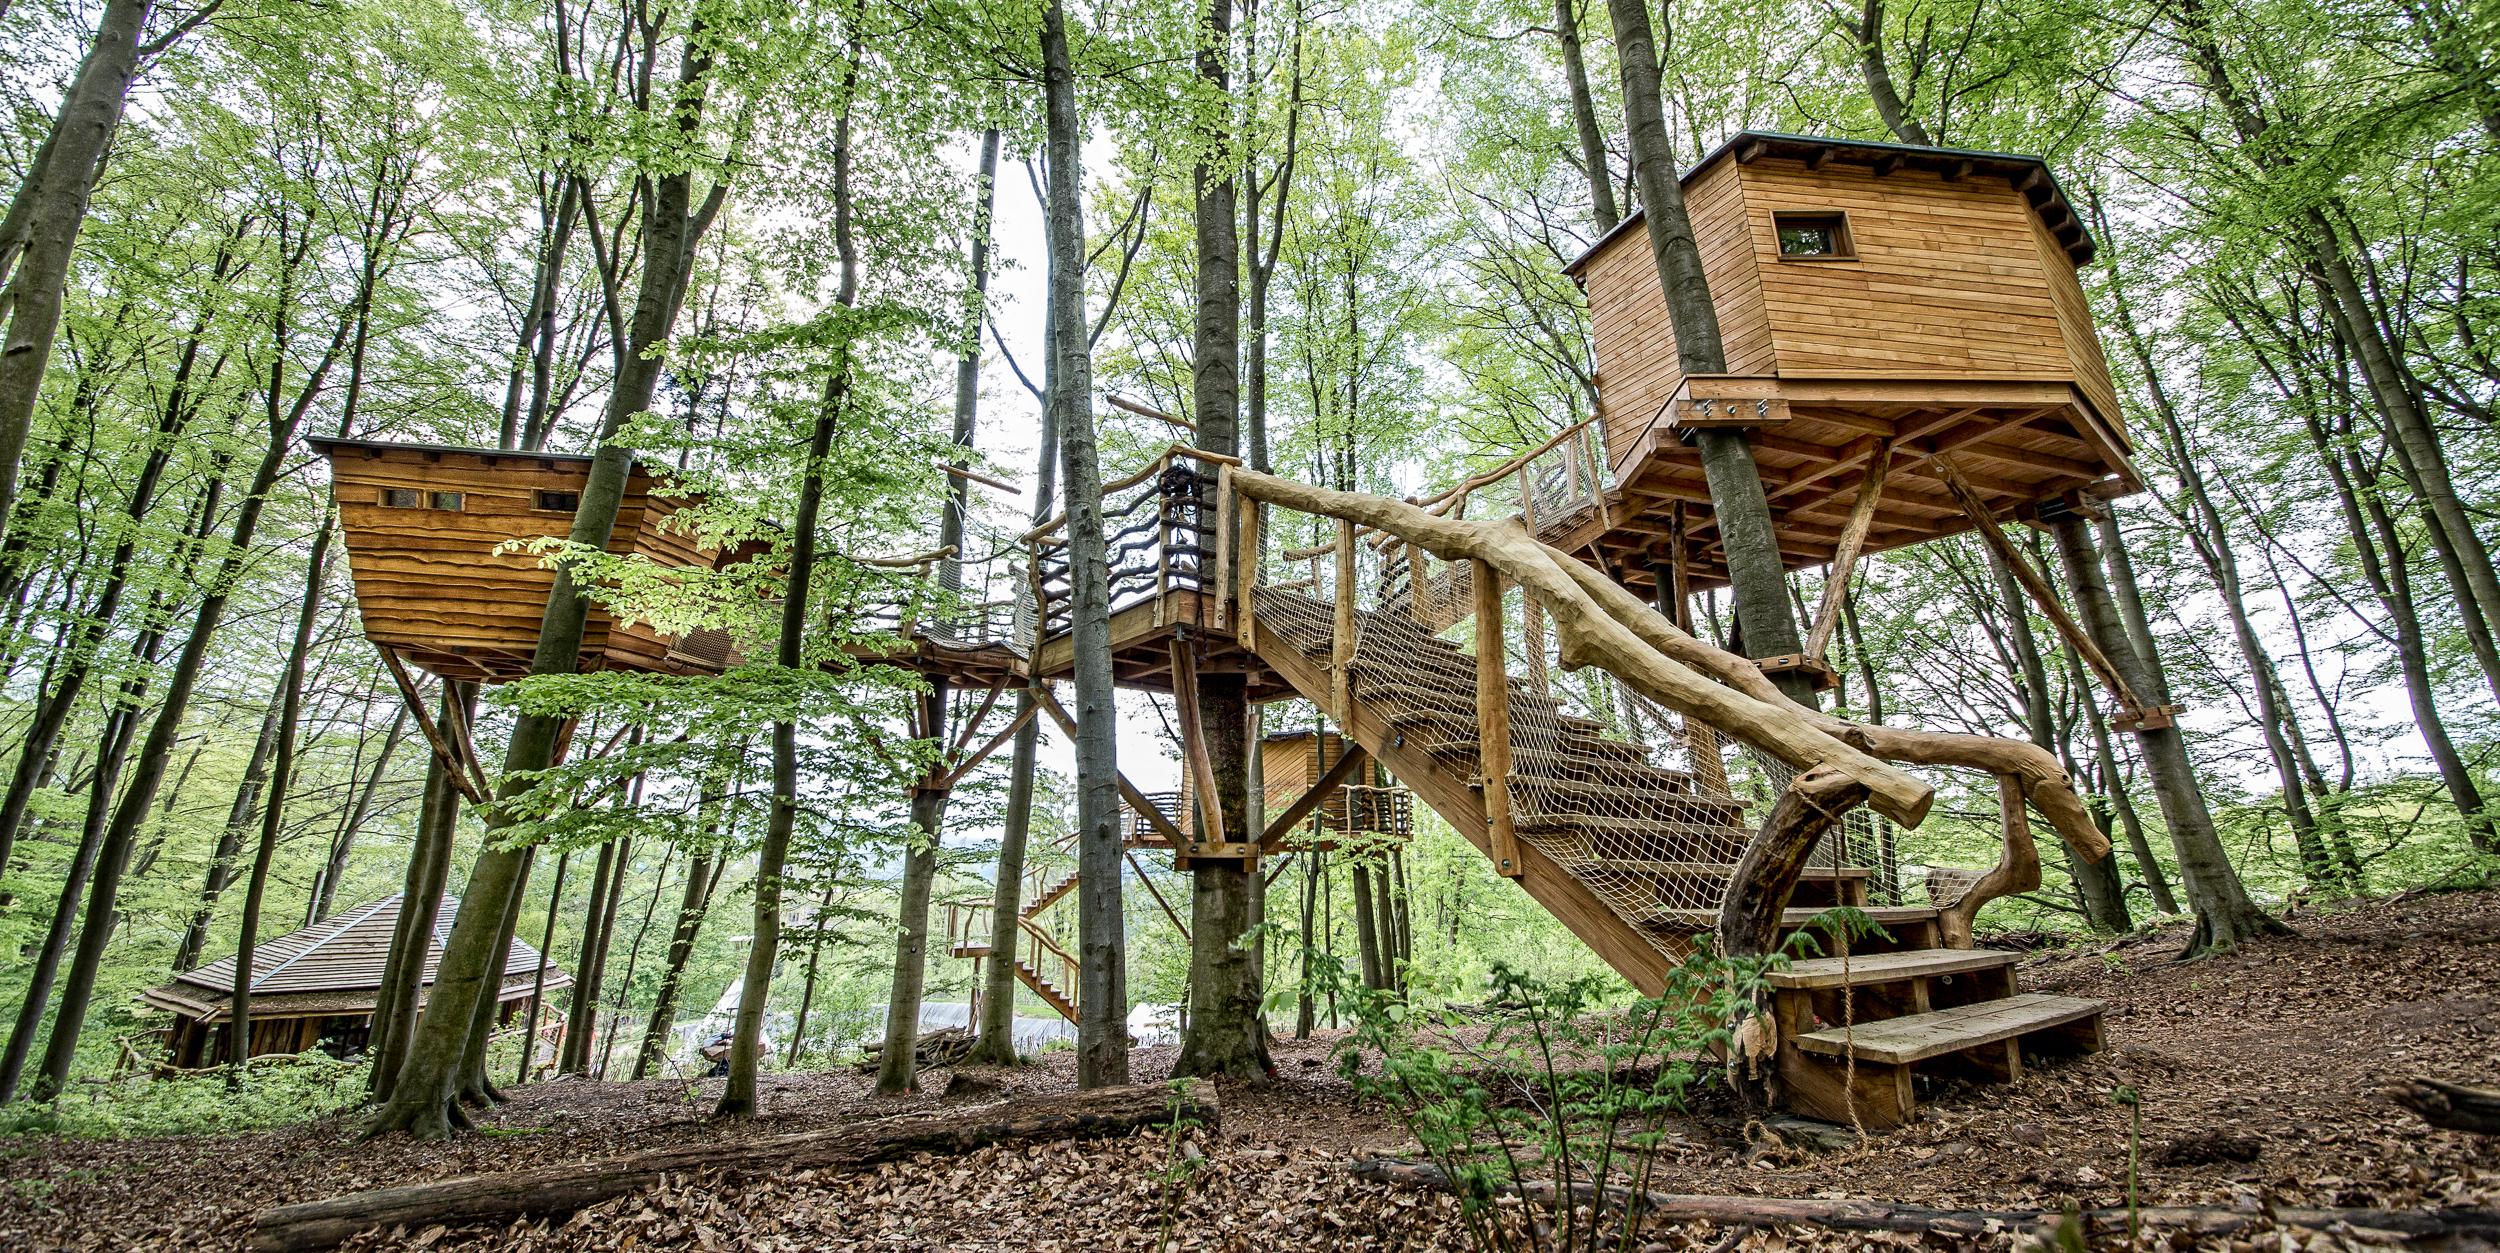 Witzenhausen, Robins Nest, Bäumhäuser©Ullrich.jpg